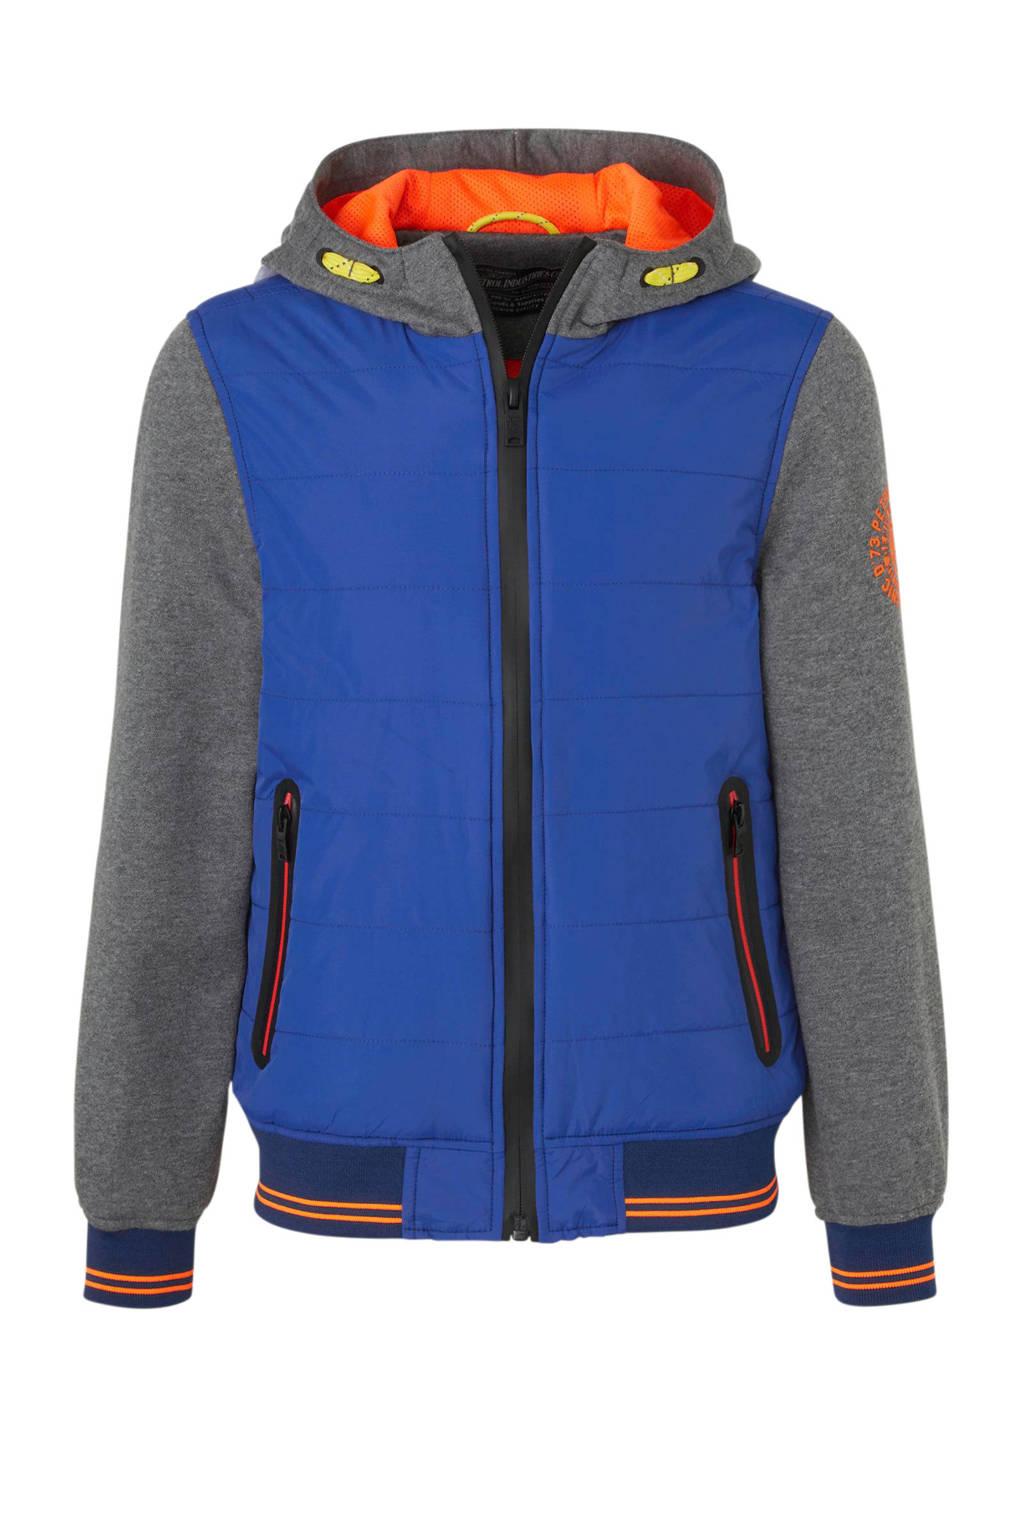 Petrol Industries zomerjas blauw/grijs/oranje, Blauw/grijs/oranje